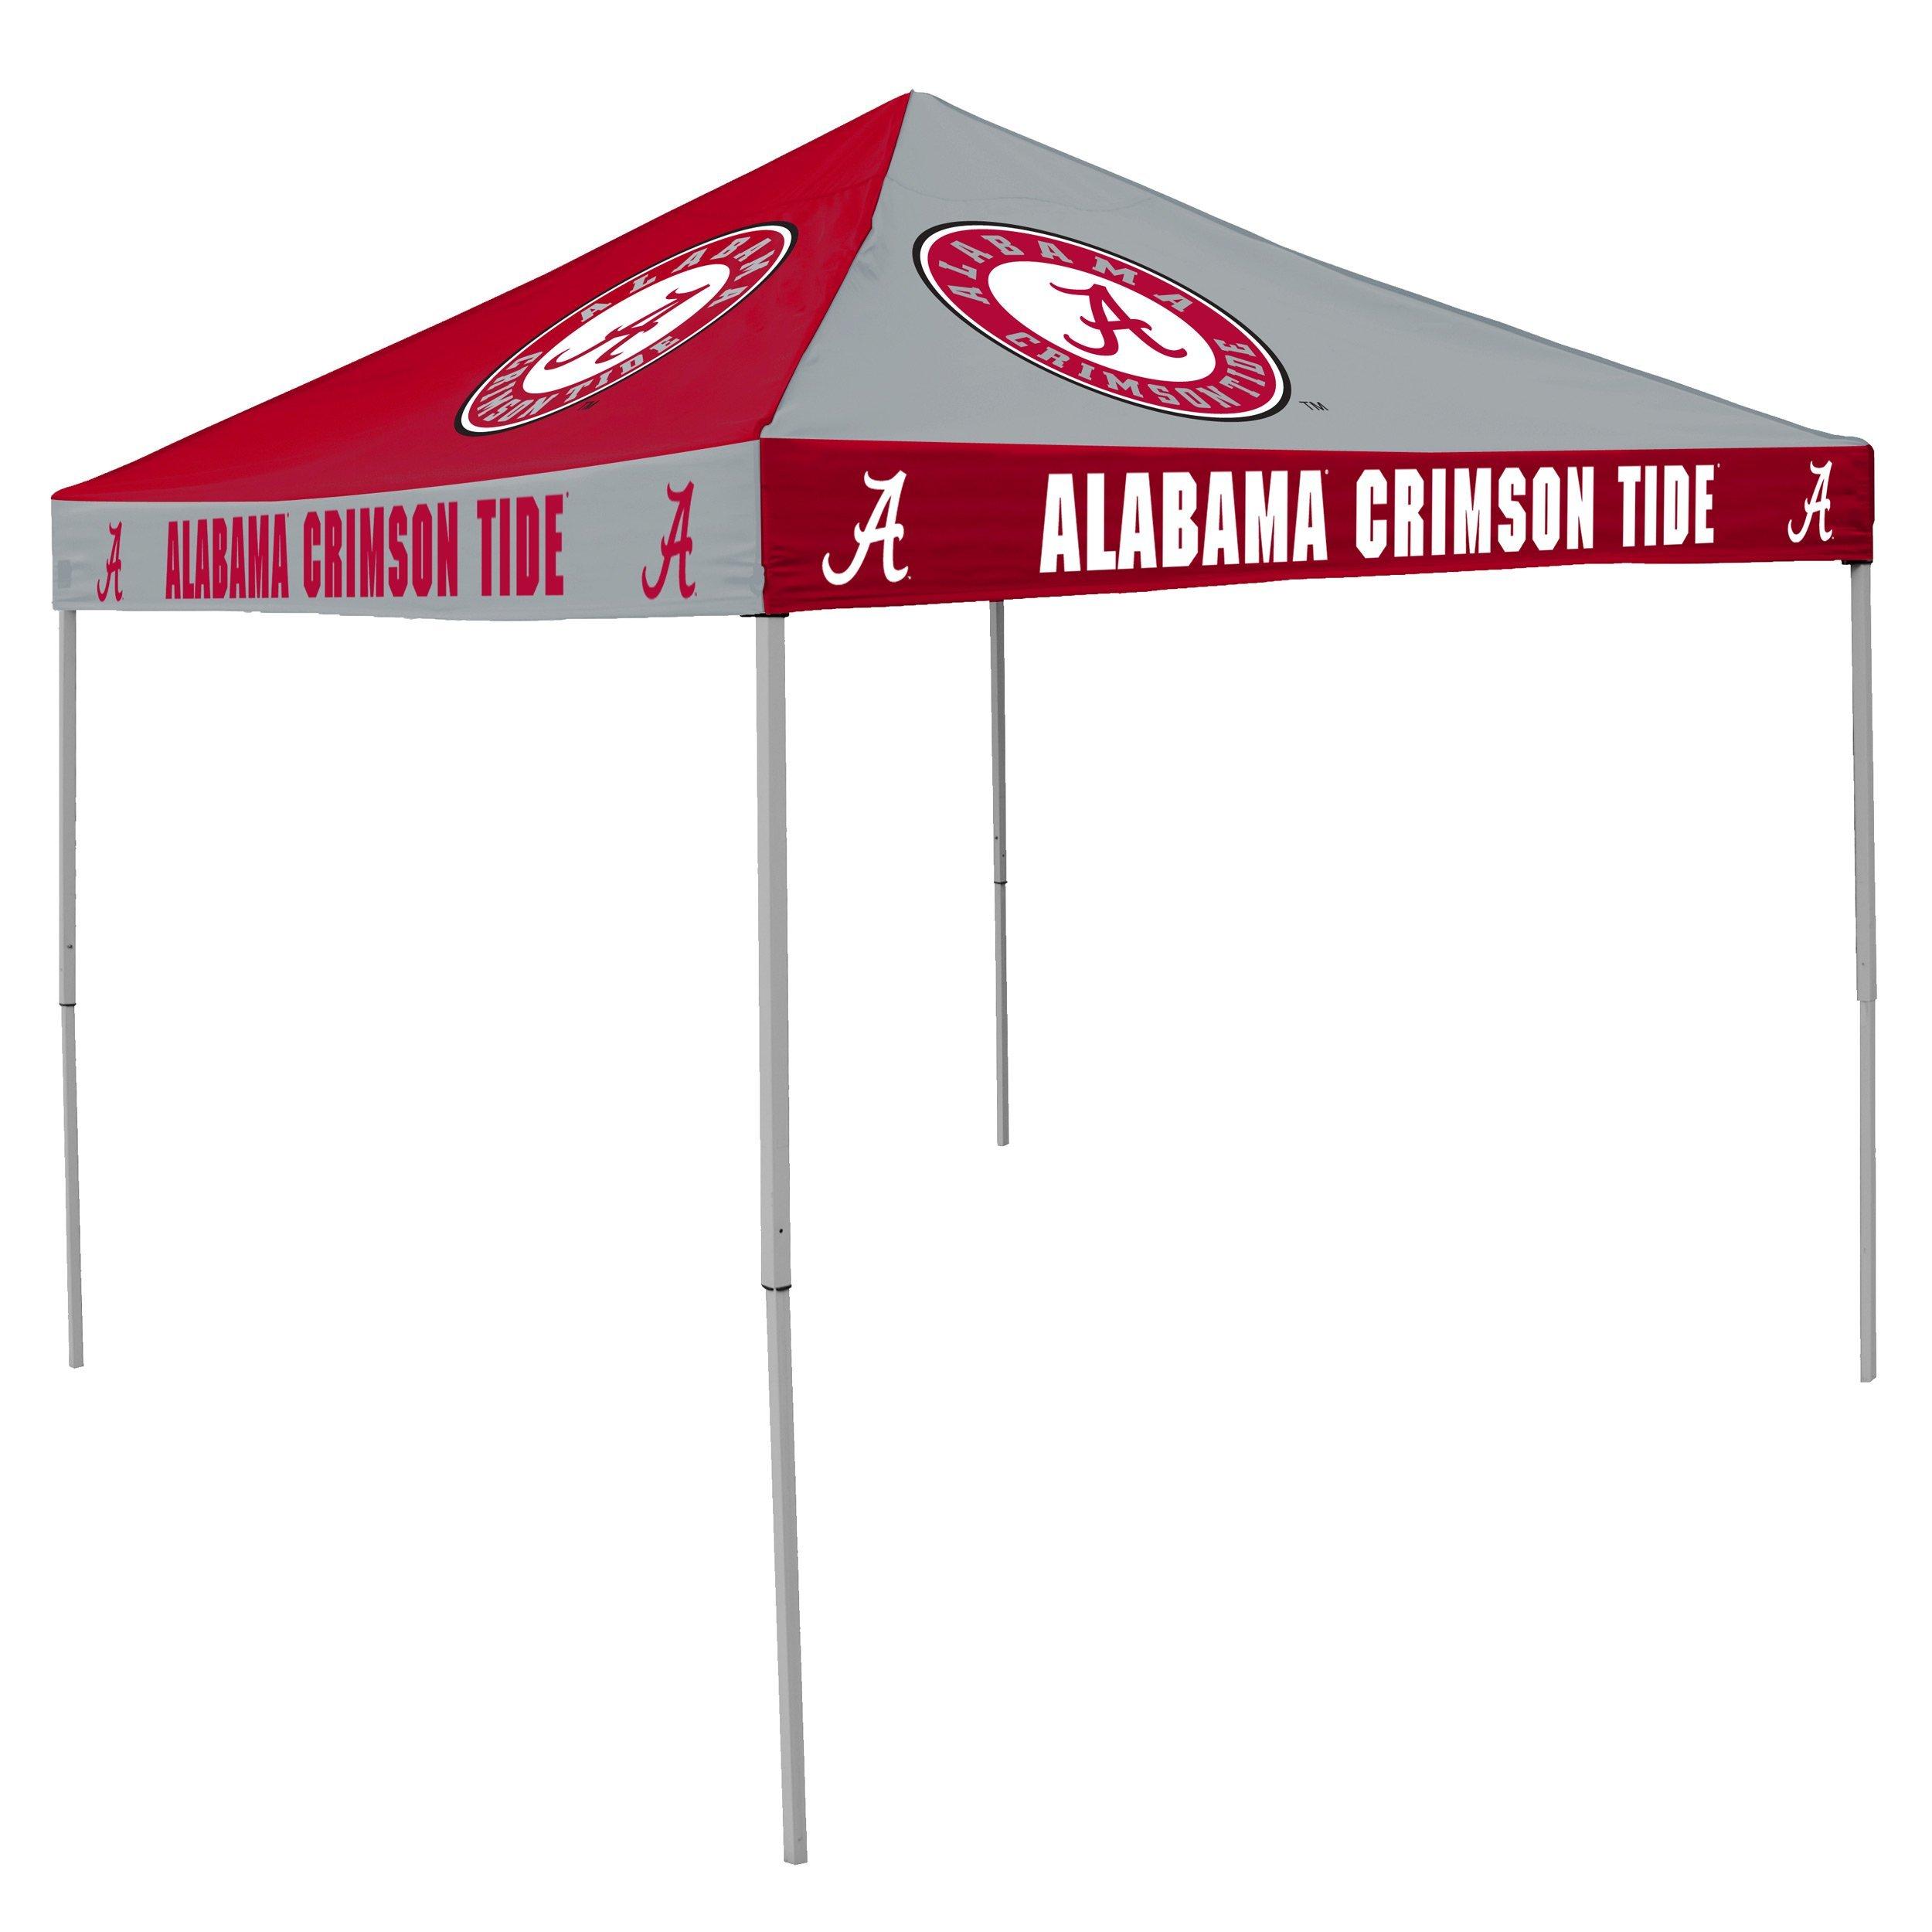 NCAA Alabama Crimson Tide 9-Foot x 9-Foot Pinwheel Tailgating Canopy, Crimson/White